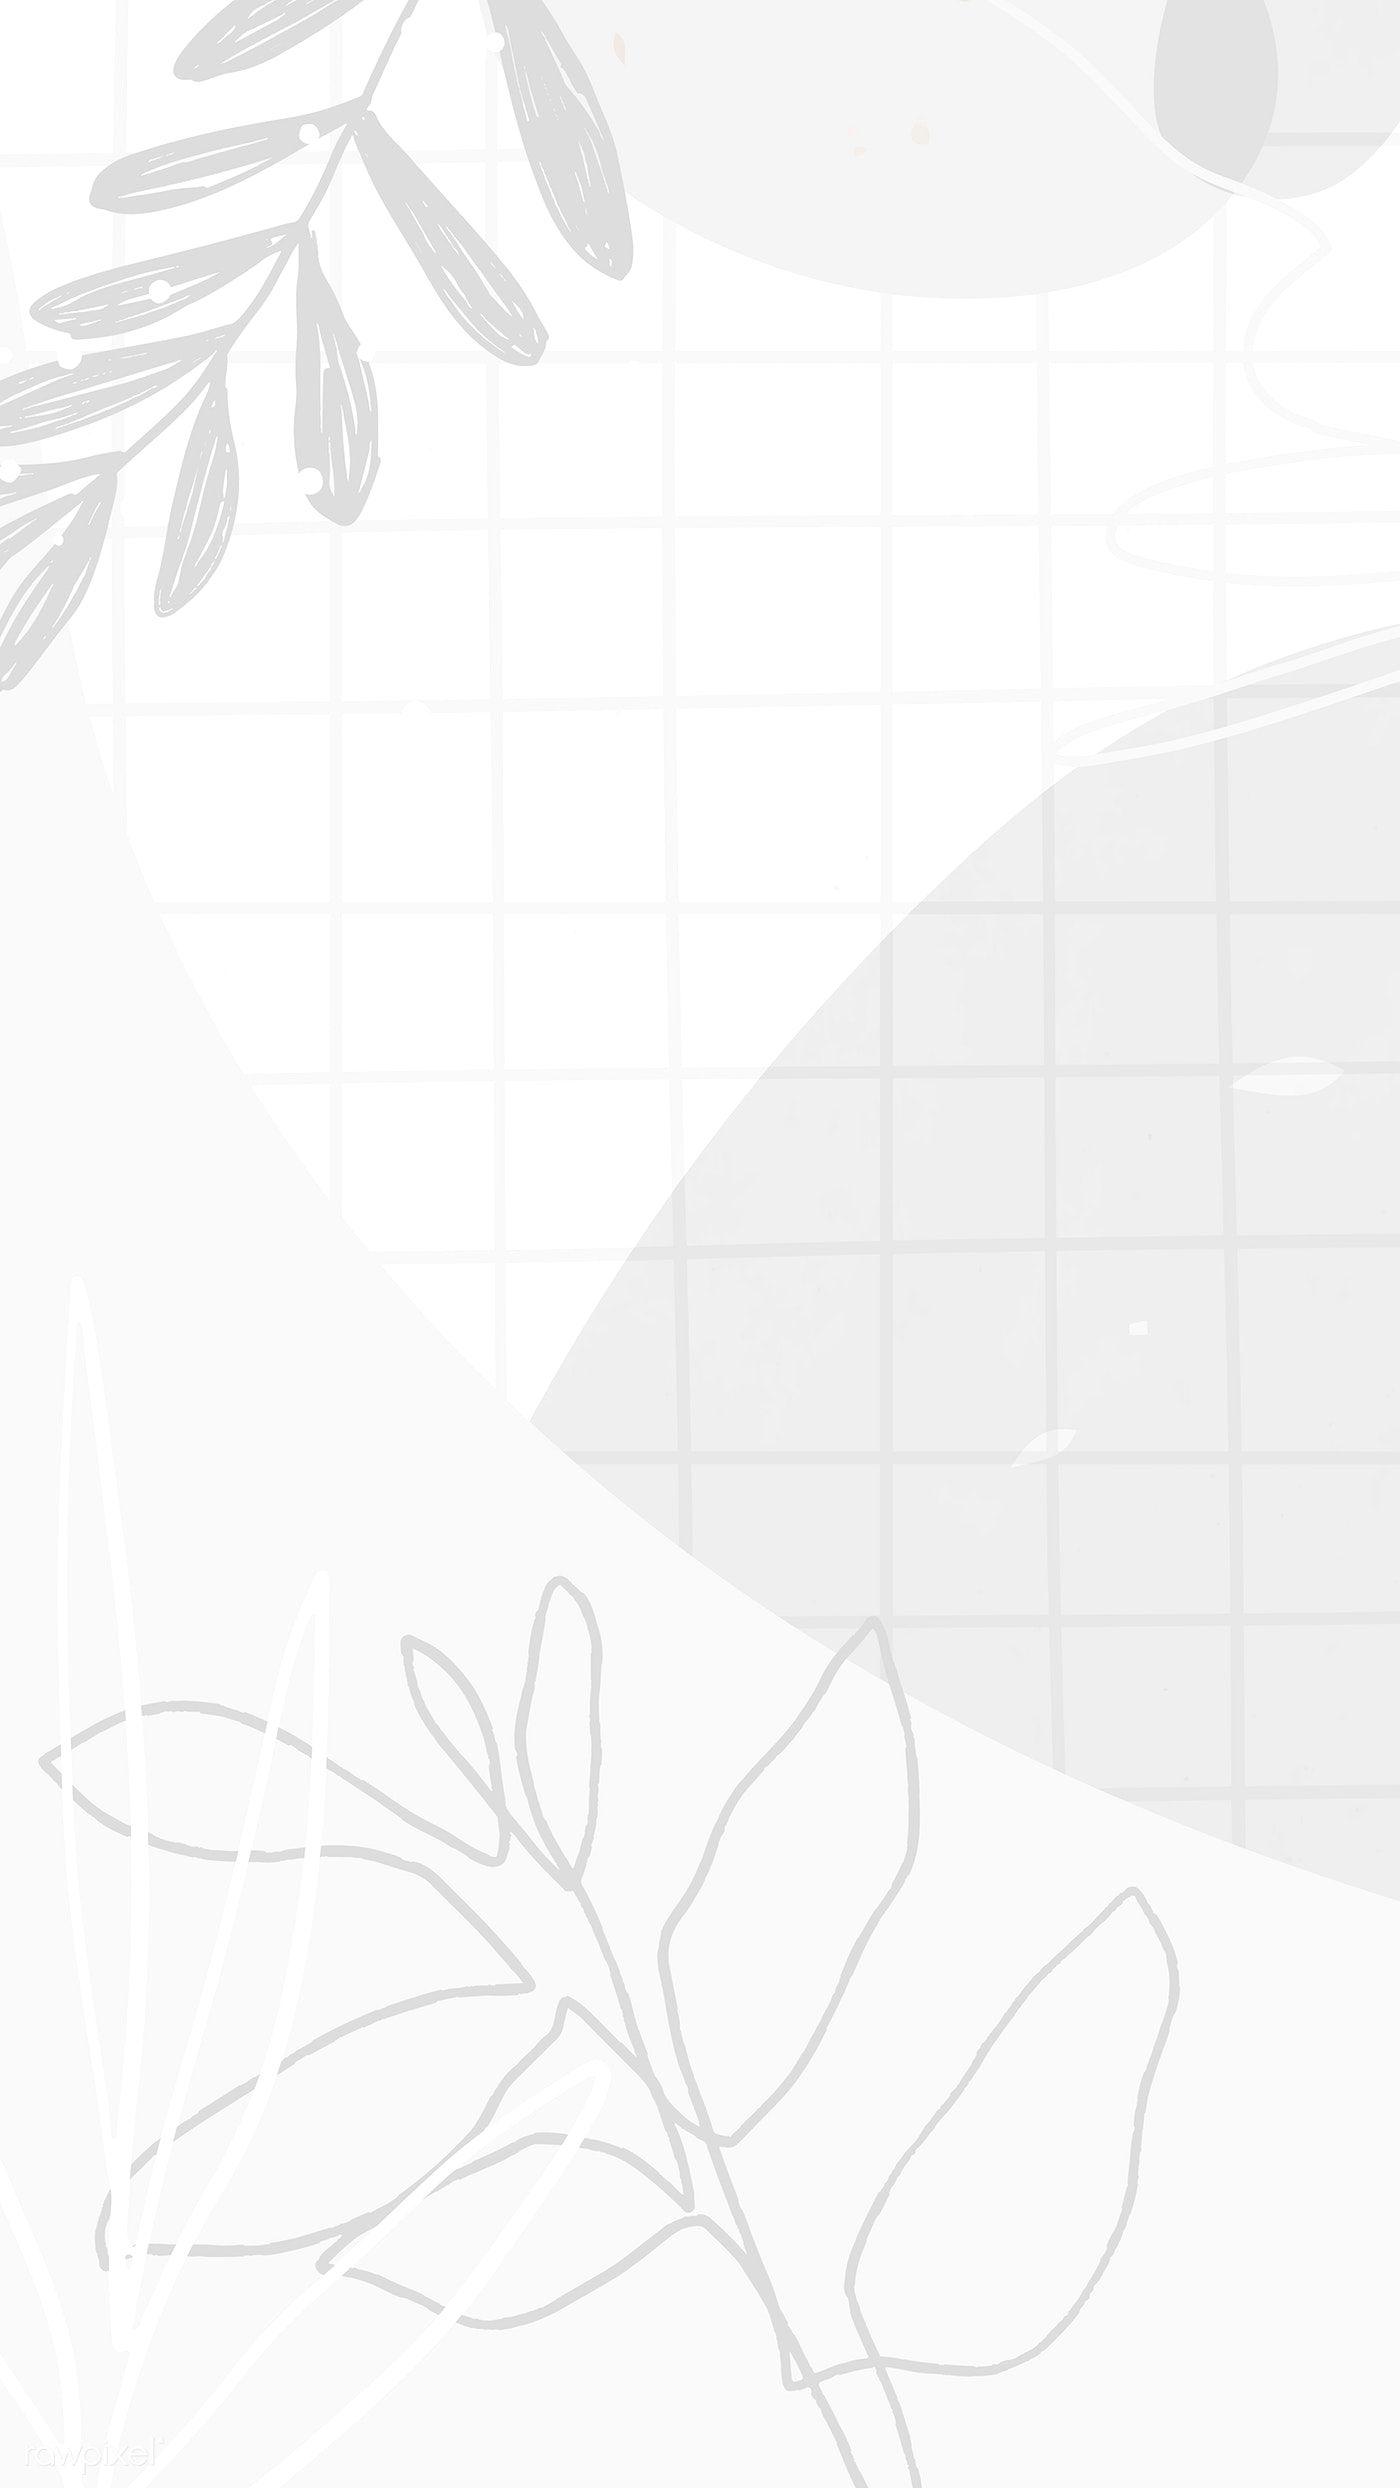 Download Premium Vector Of Abstract Memphis Mobile Phone Wallpaper 2221320 In 2020 Minimal Wallpaper Minimalist Wallpaper Cute Patterns Wallpaper